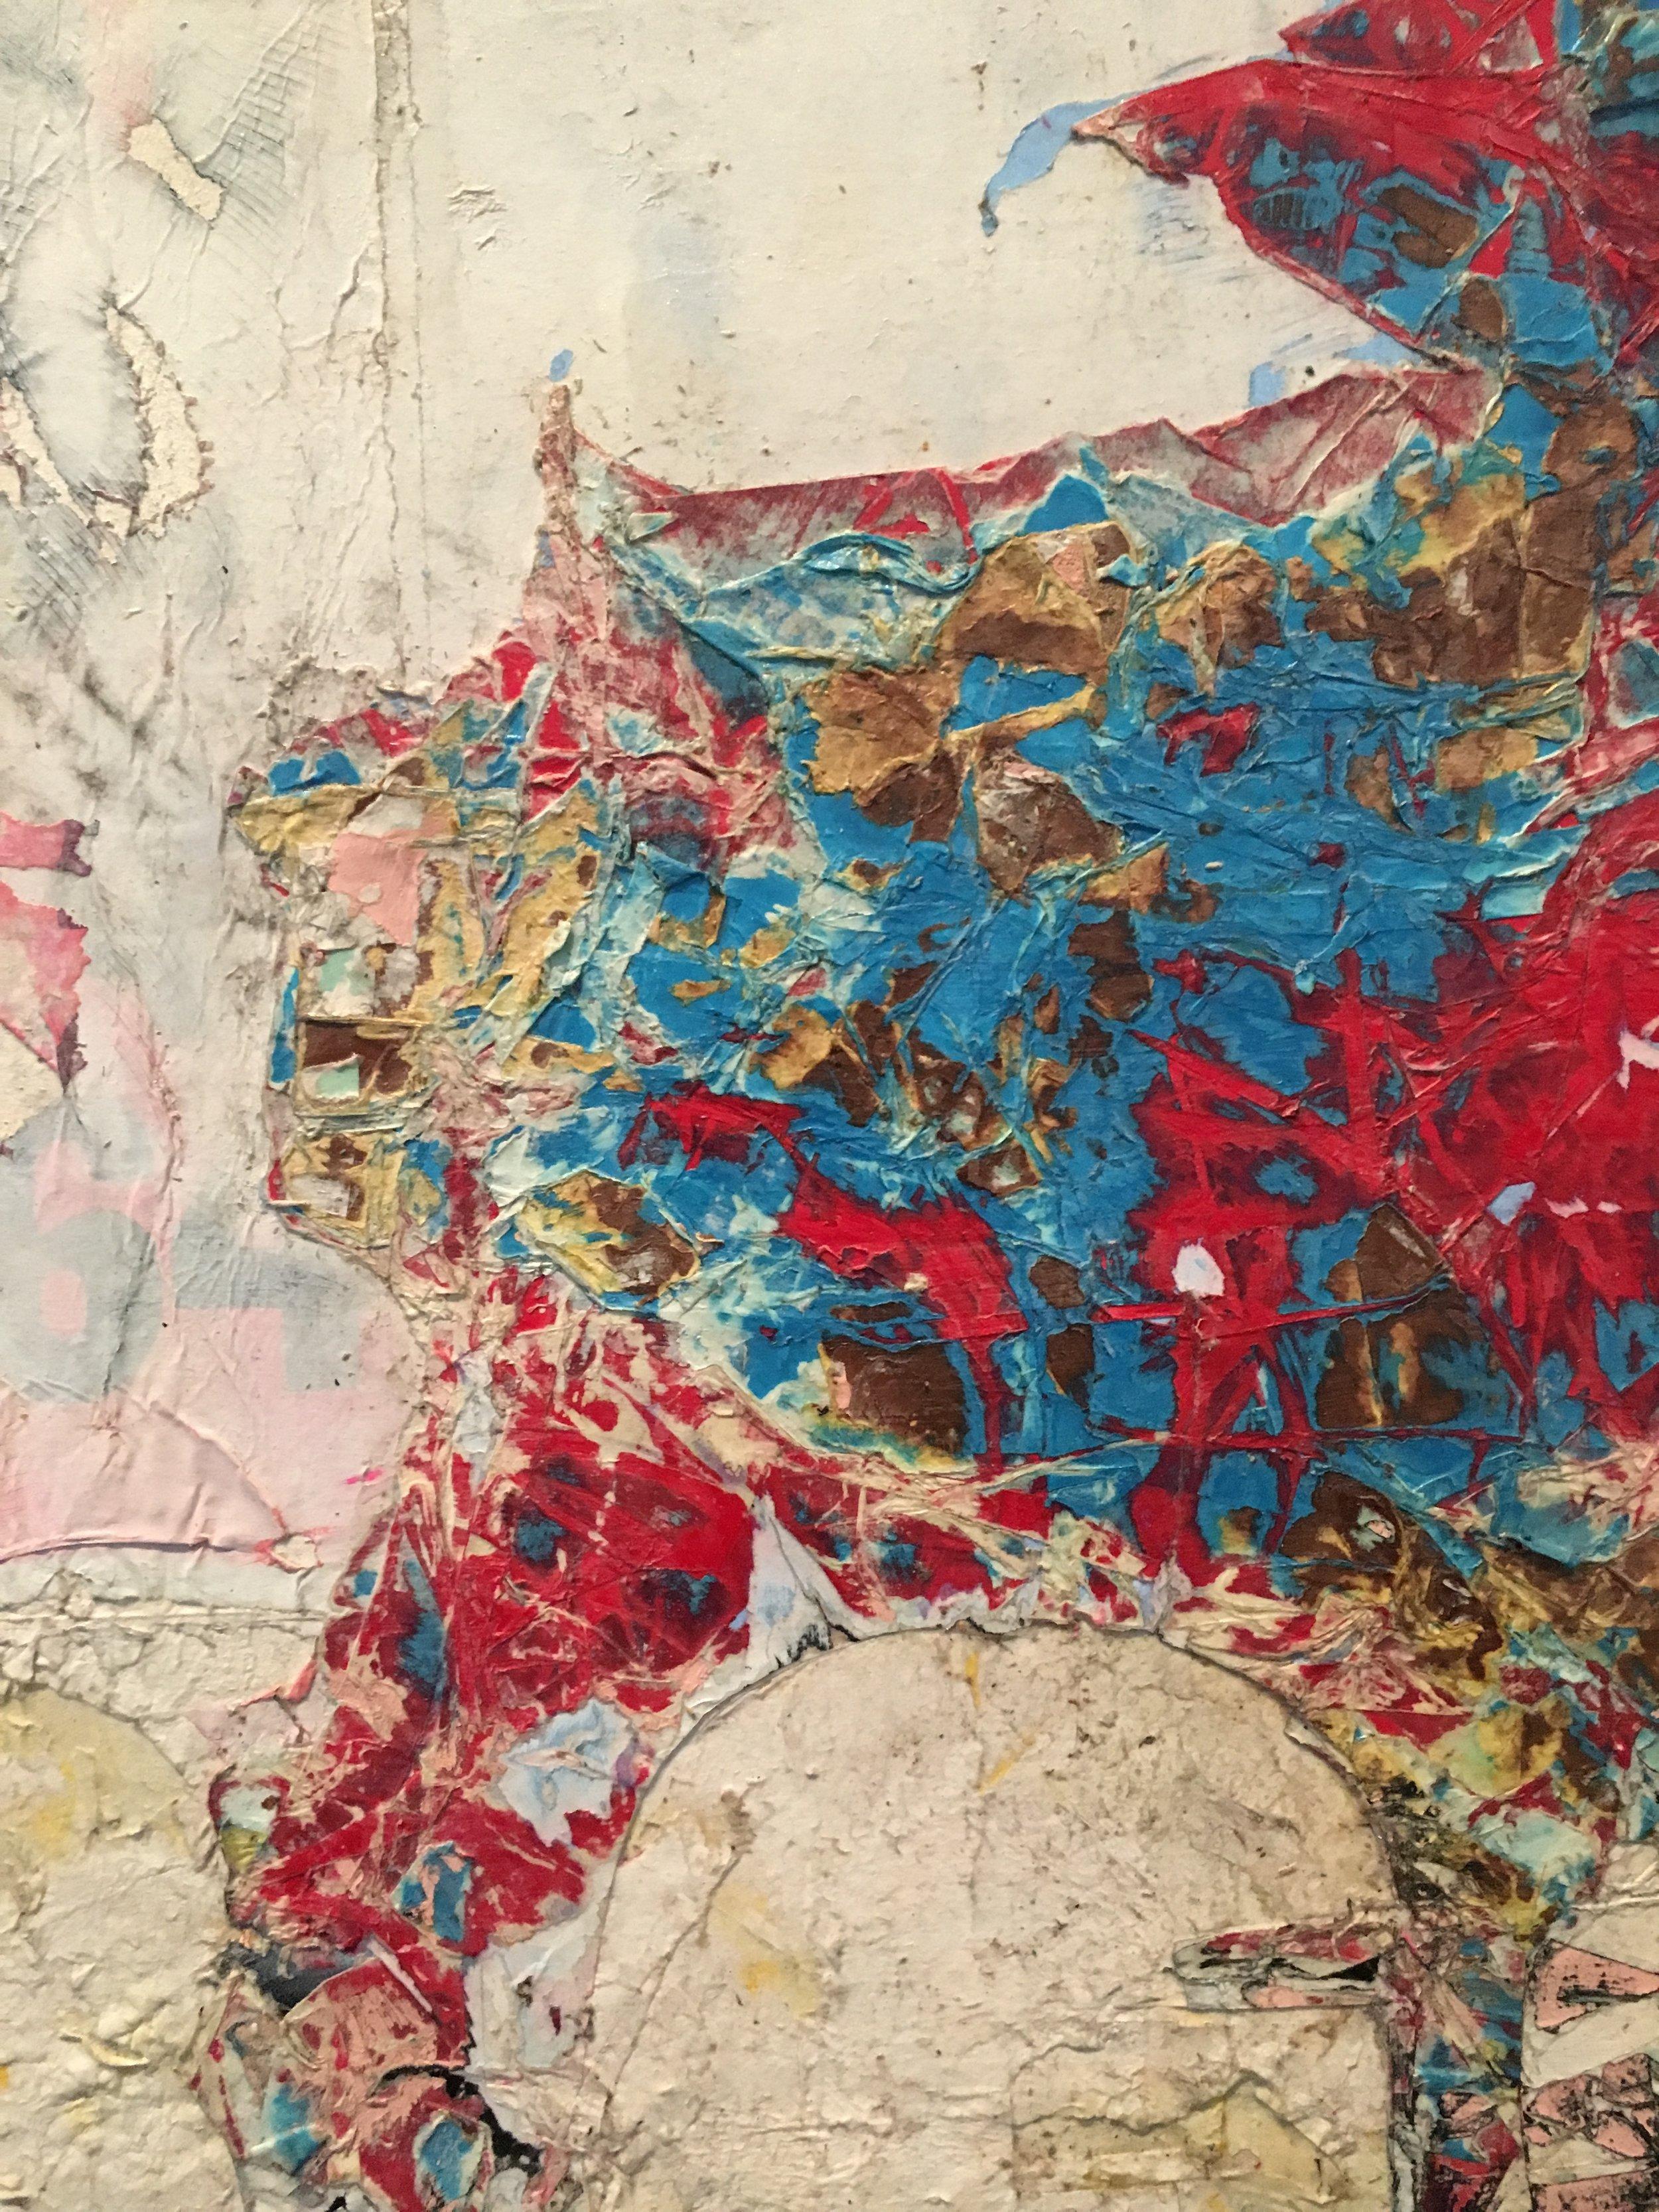 Detail of  Mark Bradford's  150 Portrait Tone  at LACMA